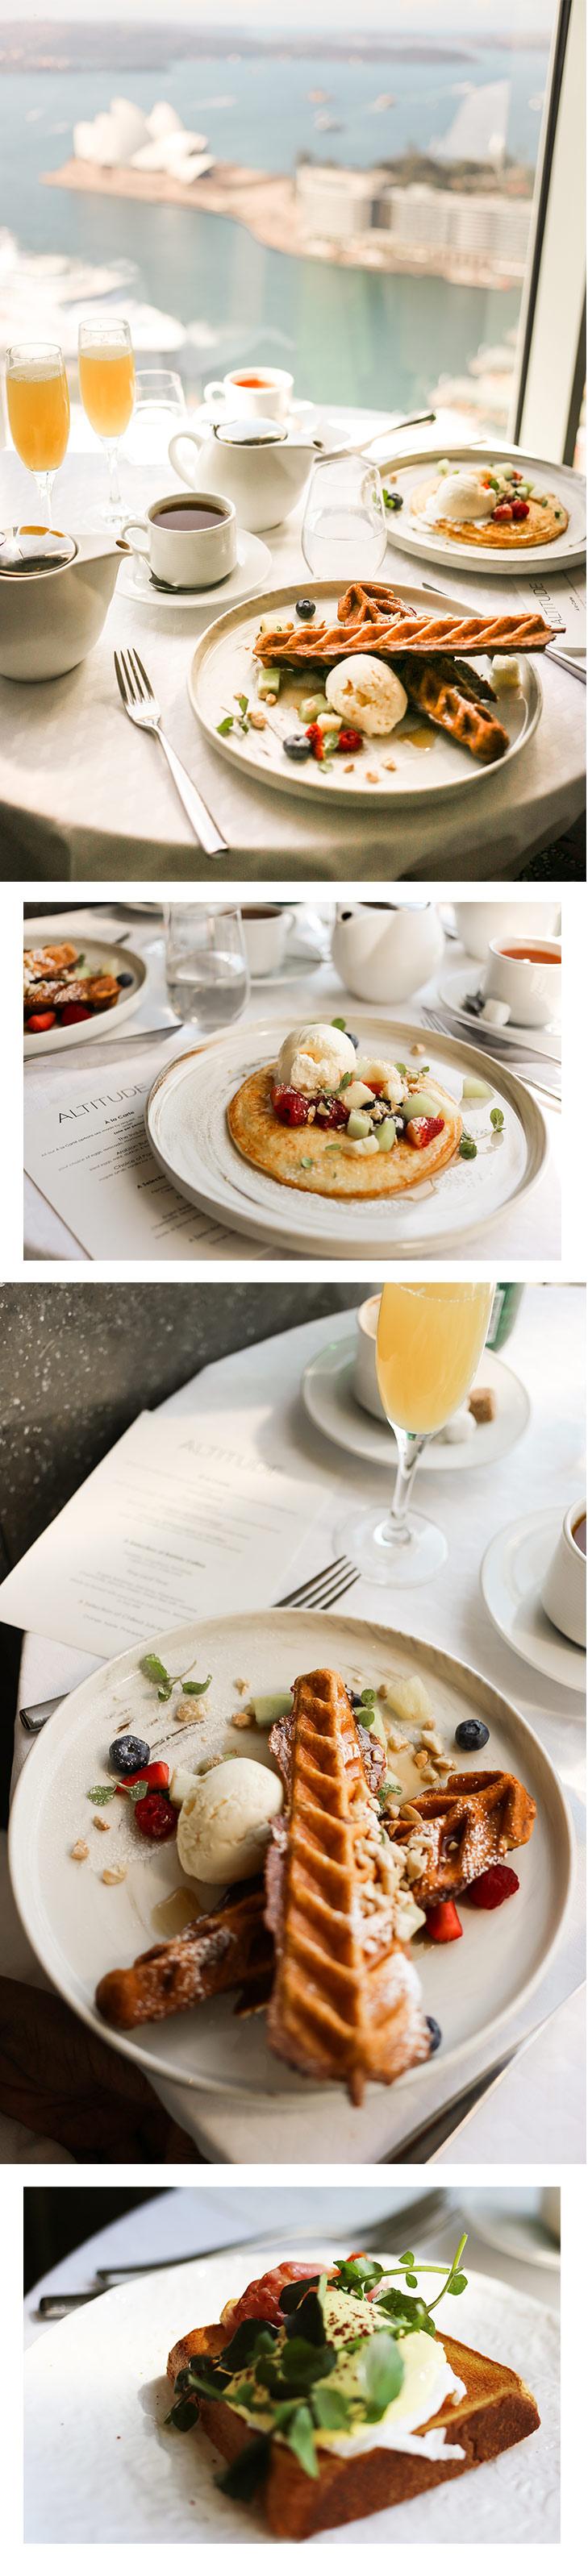 Delicious brunch at Altitude, Shangri-La Sydney. Photos by May Leong.